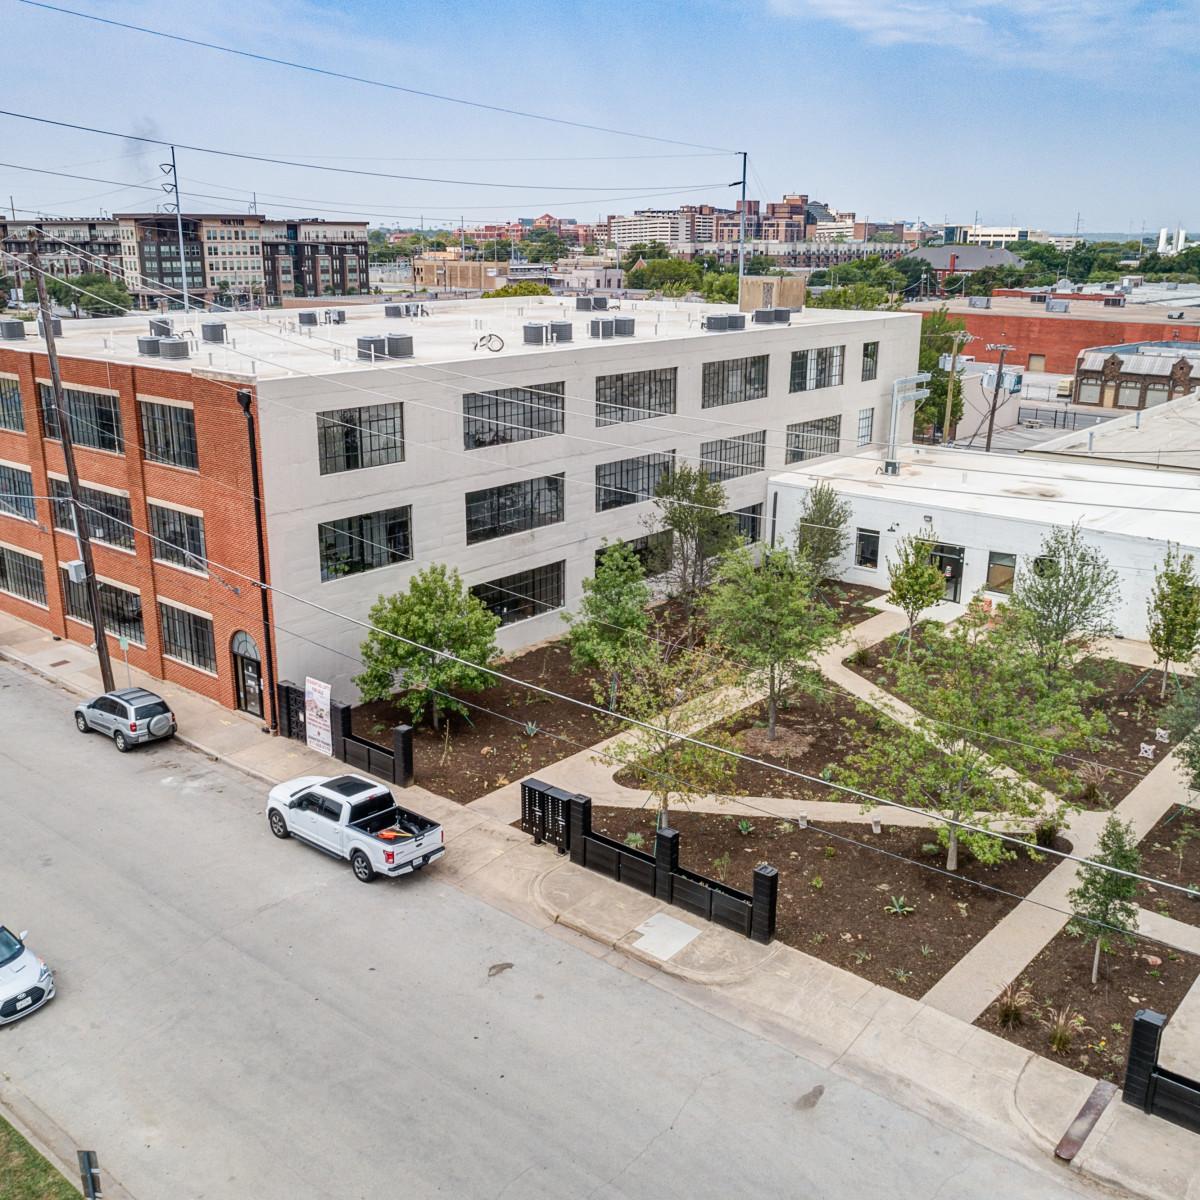 Dickson-Jenkins lofts Fort Worth